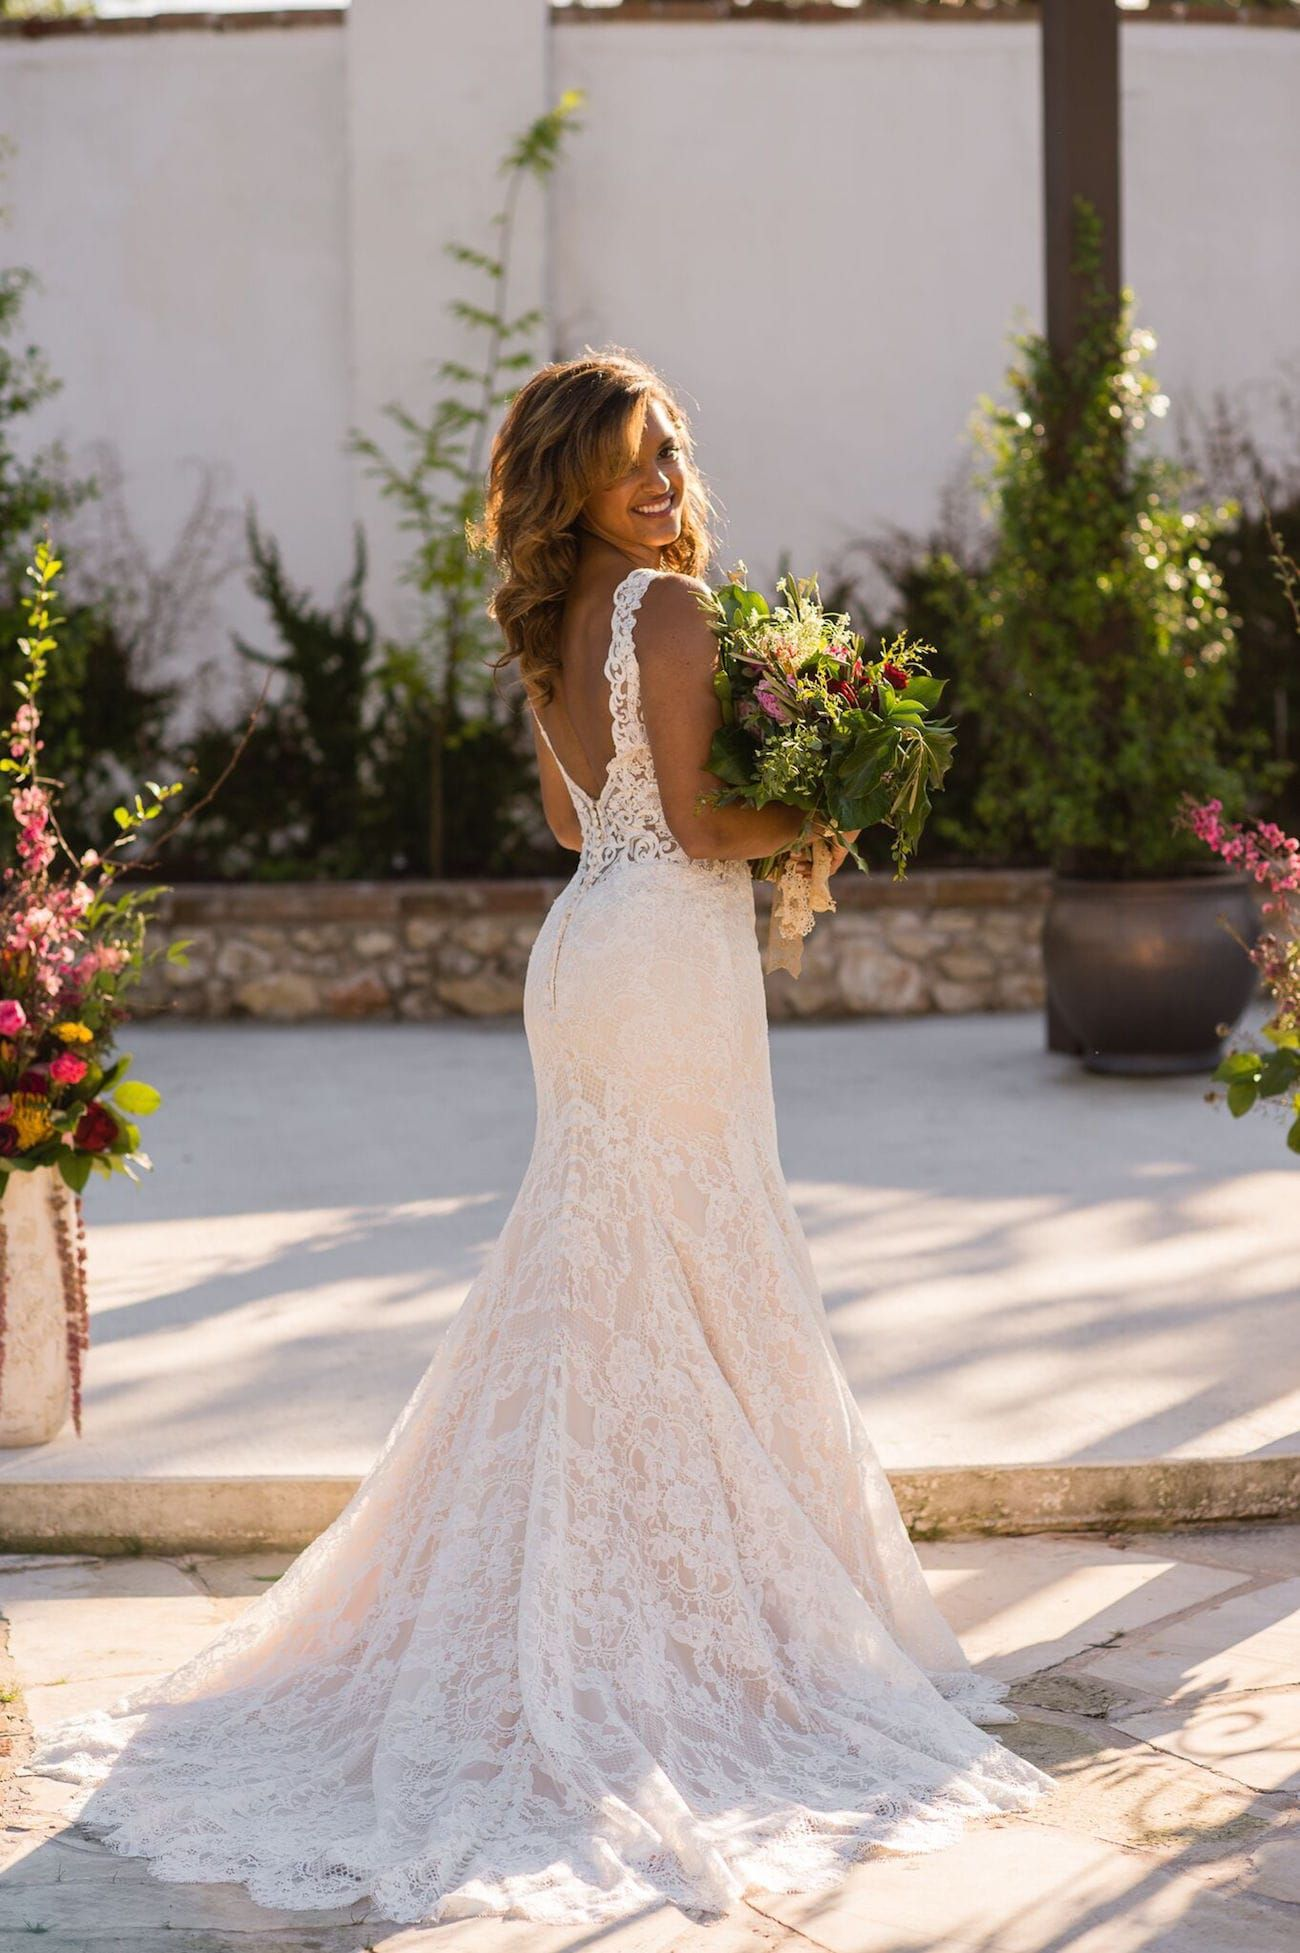 Spanish Summer Wedding Inspiration By Uche Photography Spanish Wedding Dress Wedding Inspiration Summer Lace Princess Wedding Dresses [ 1953 x 1300 Pixel ]